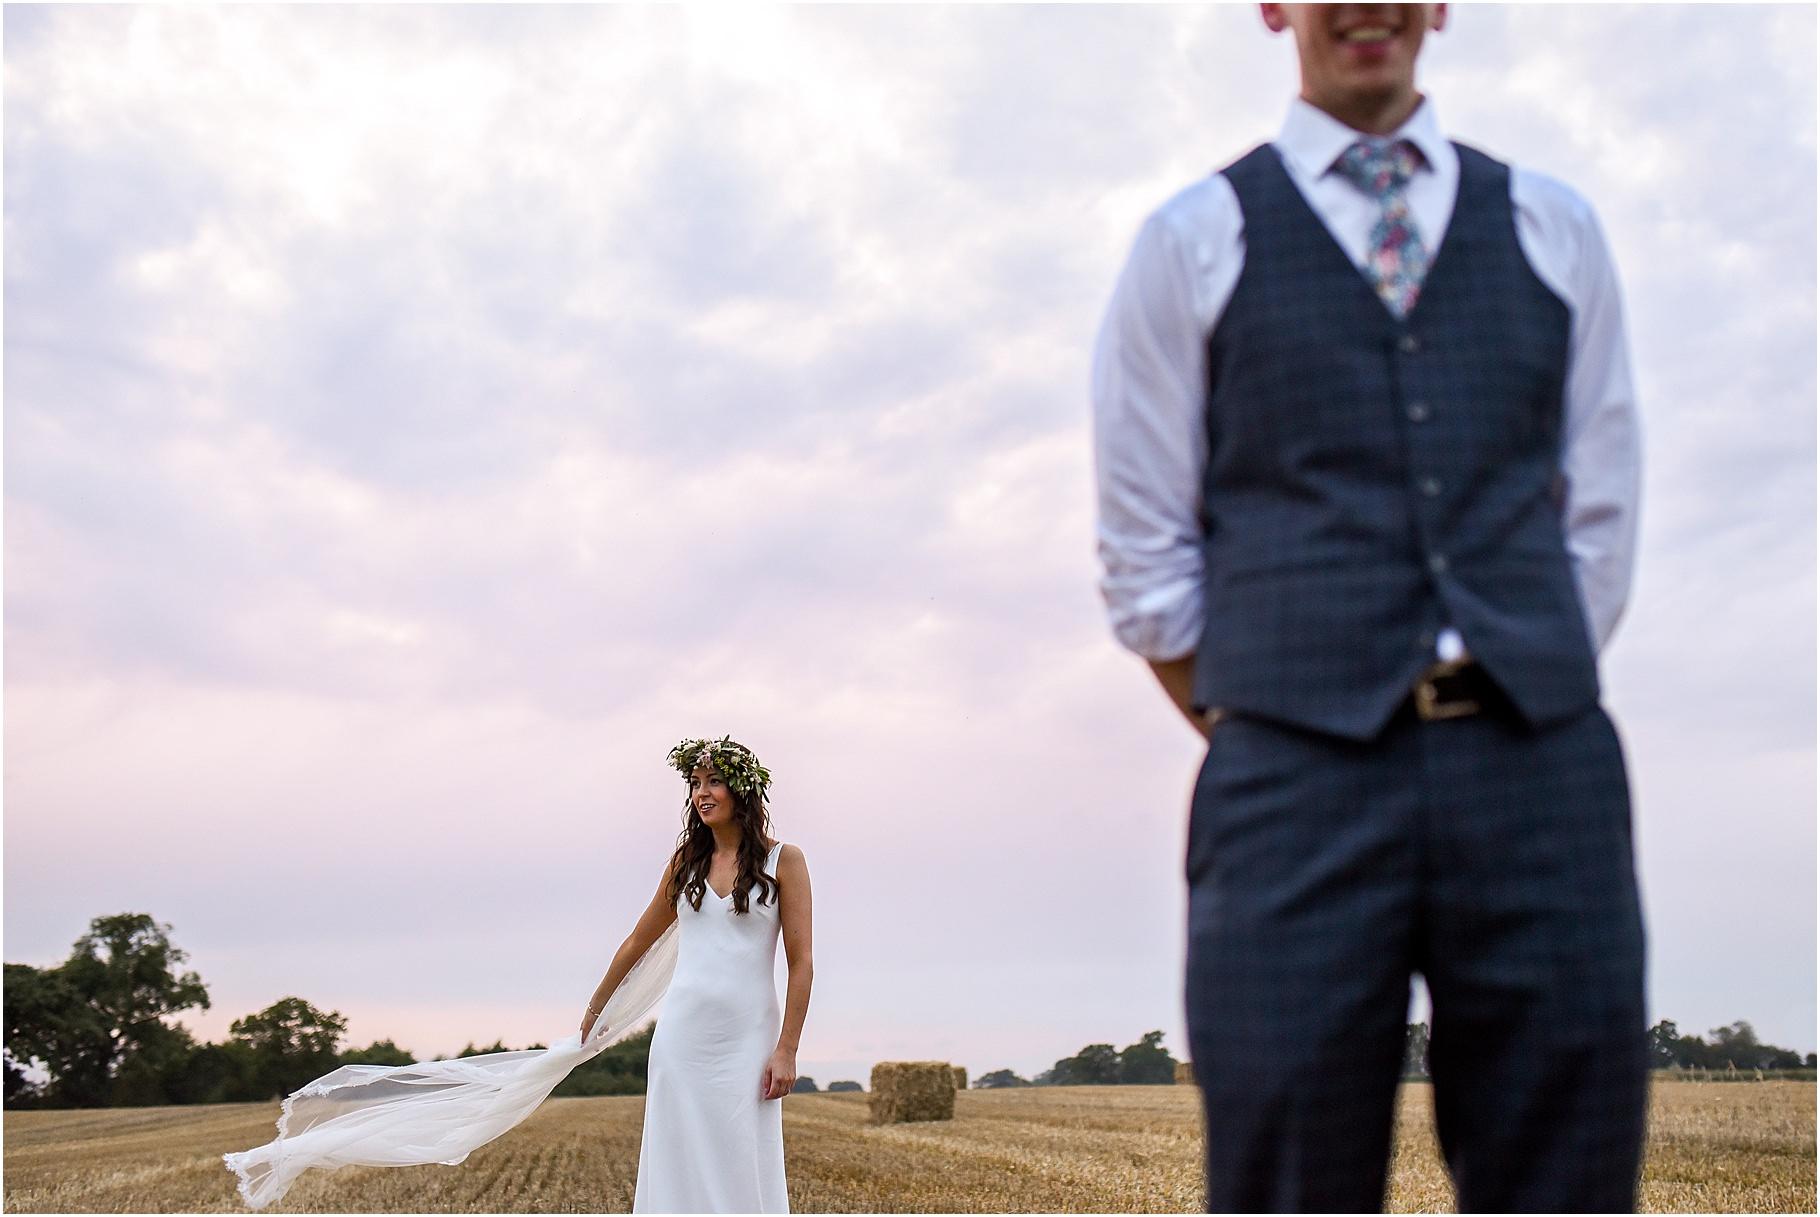 dan-wootton-photography-2017-weddings-115.jpg